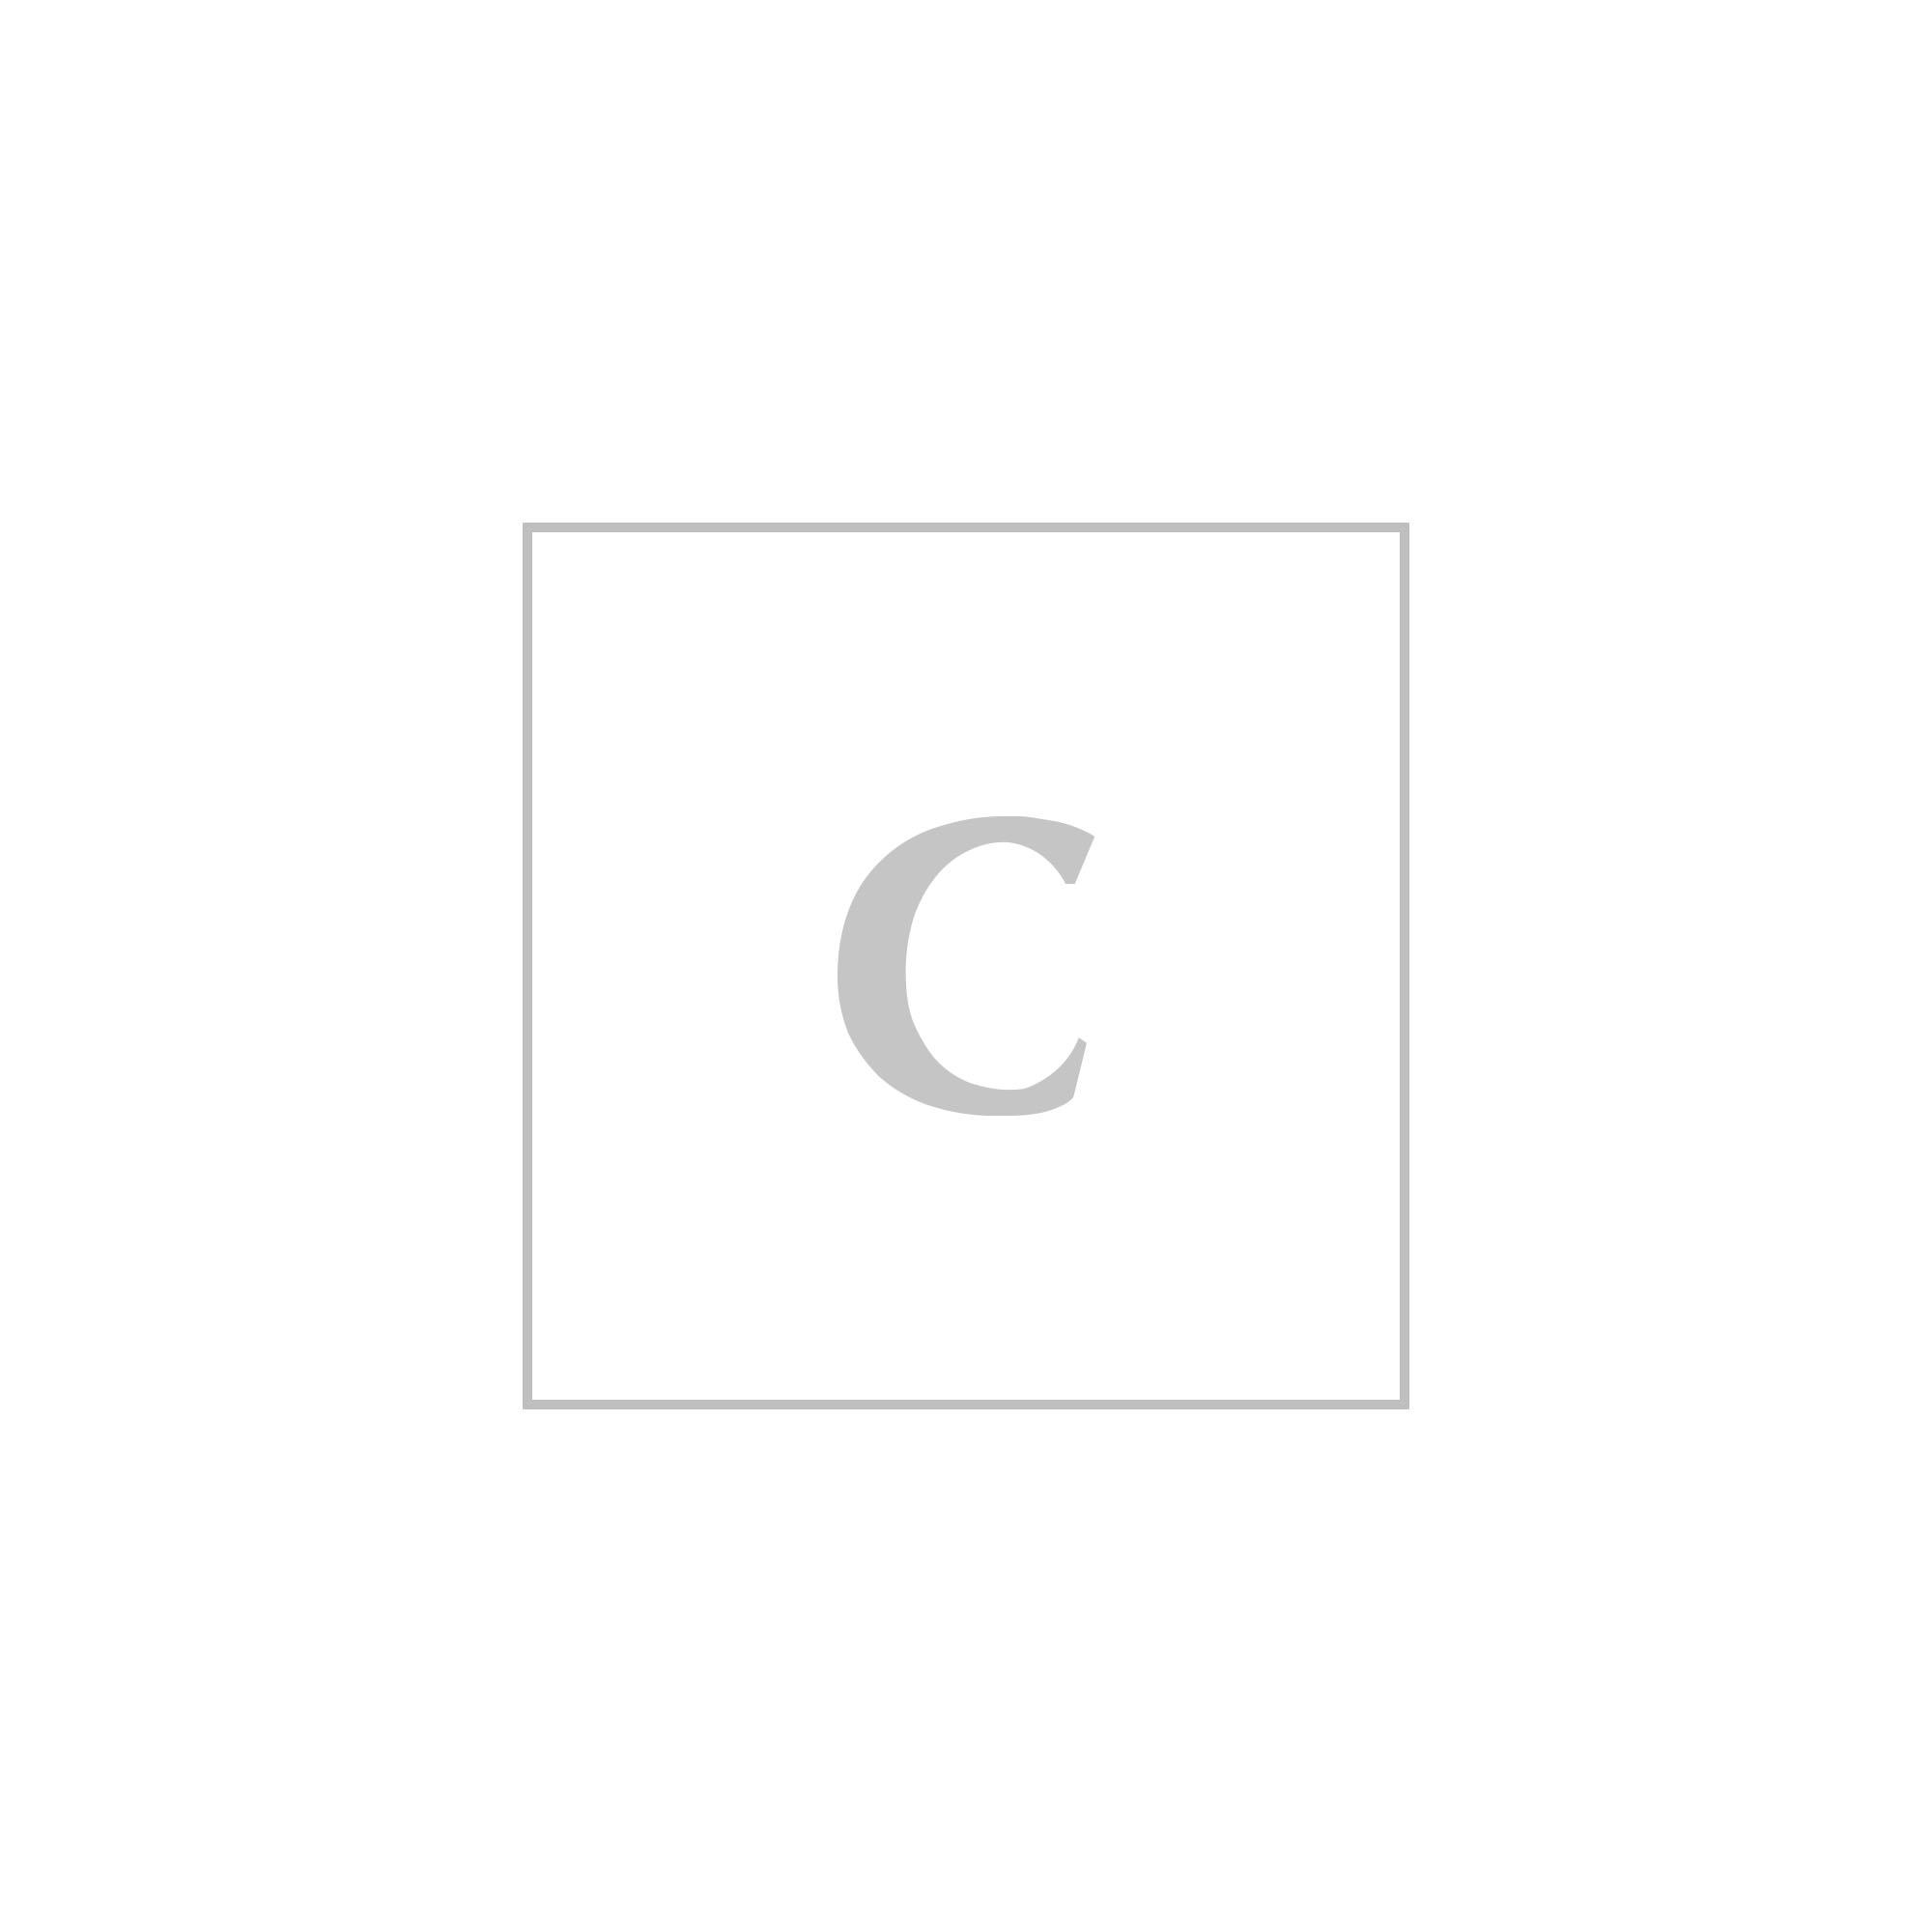 Stella mccartney borsa mini tote shiny dotted chamois falabella